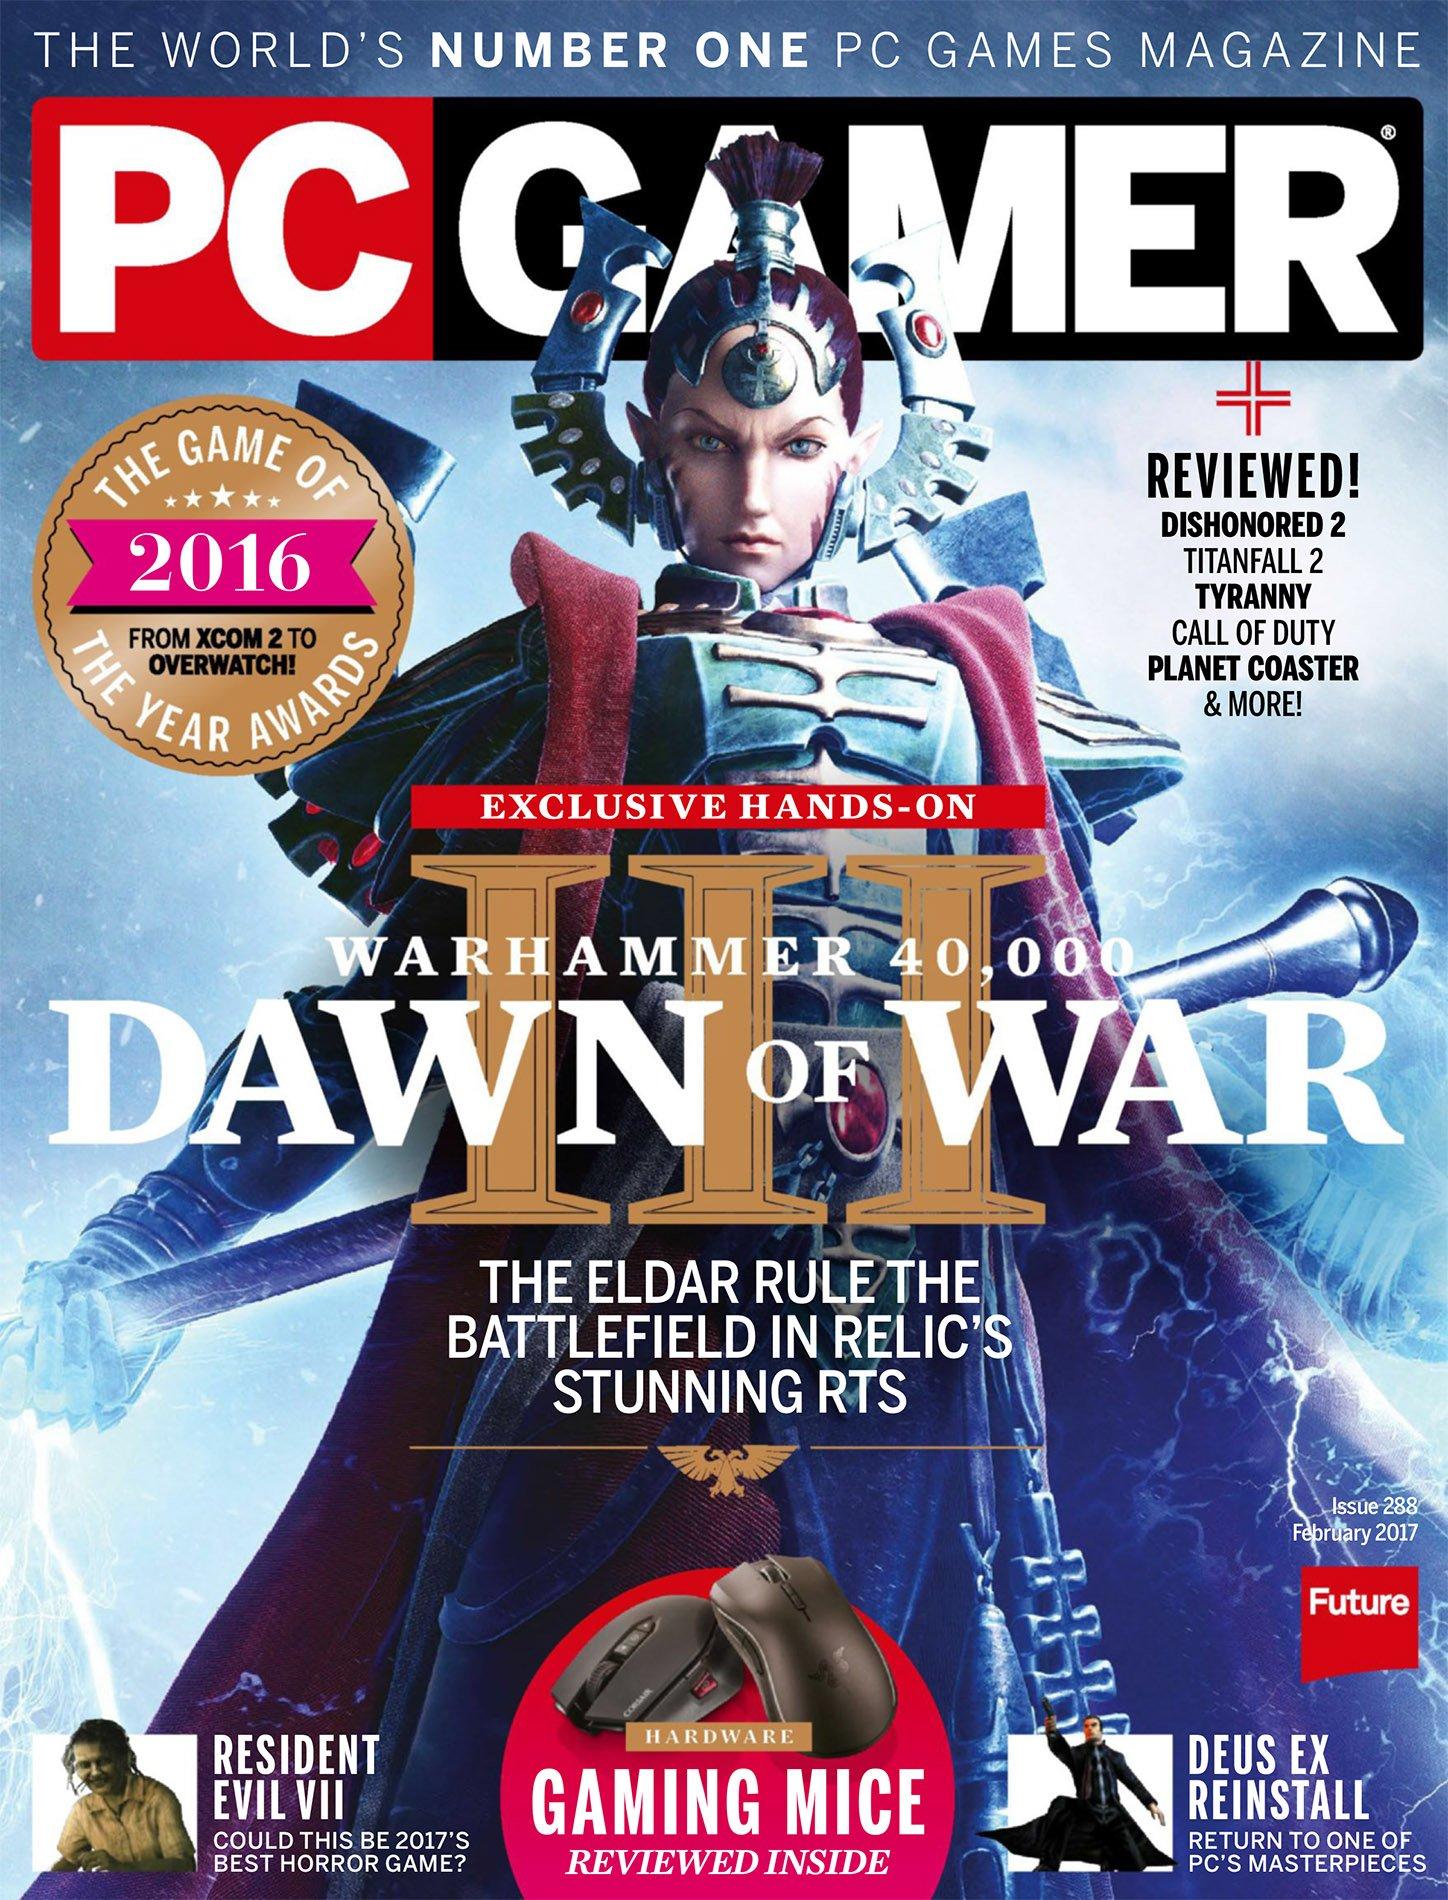 PC Gamer Issue 288 February 2017